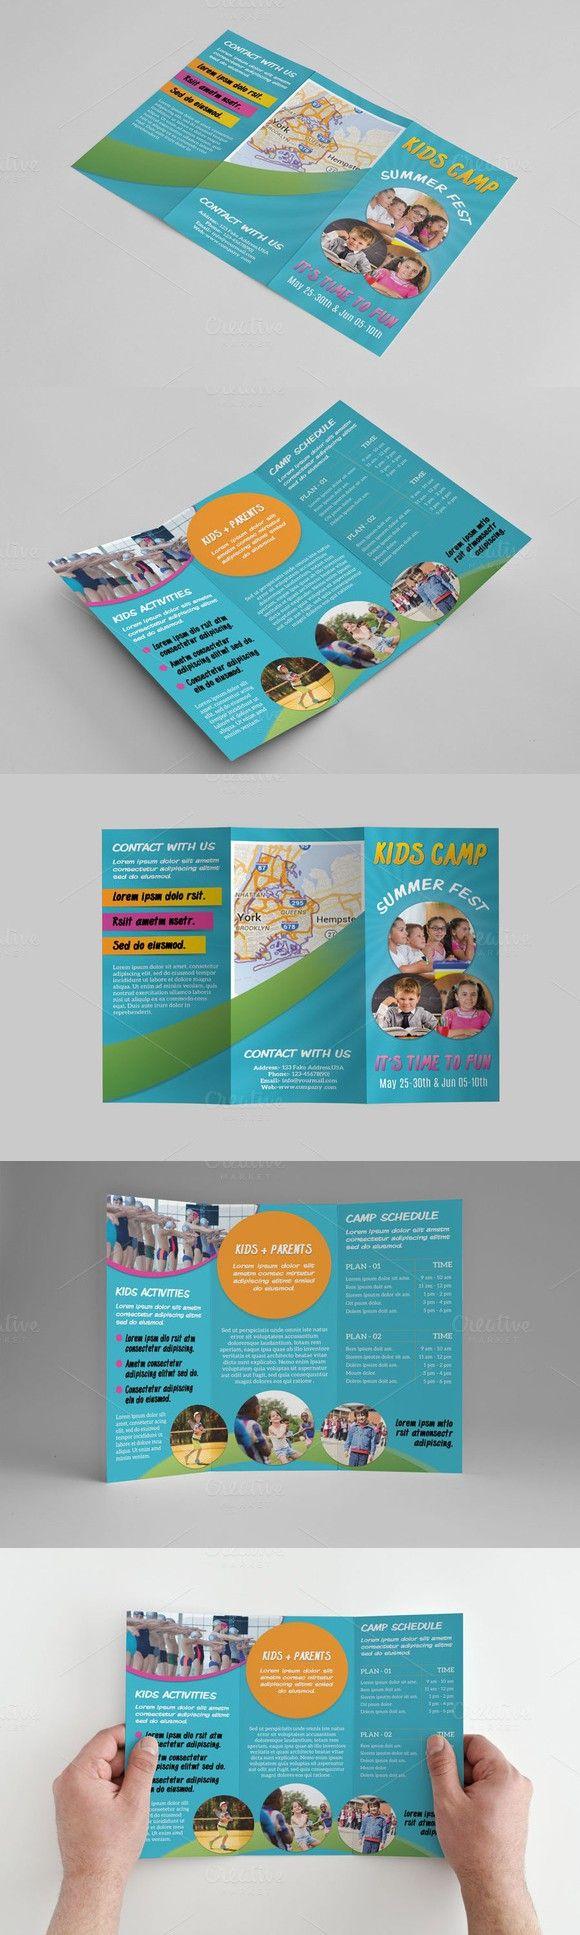 7 best Ayara Design images on Pinterest | Editorial design ...